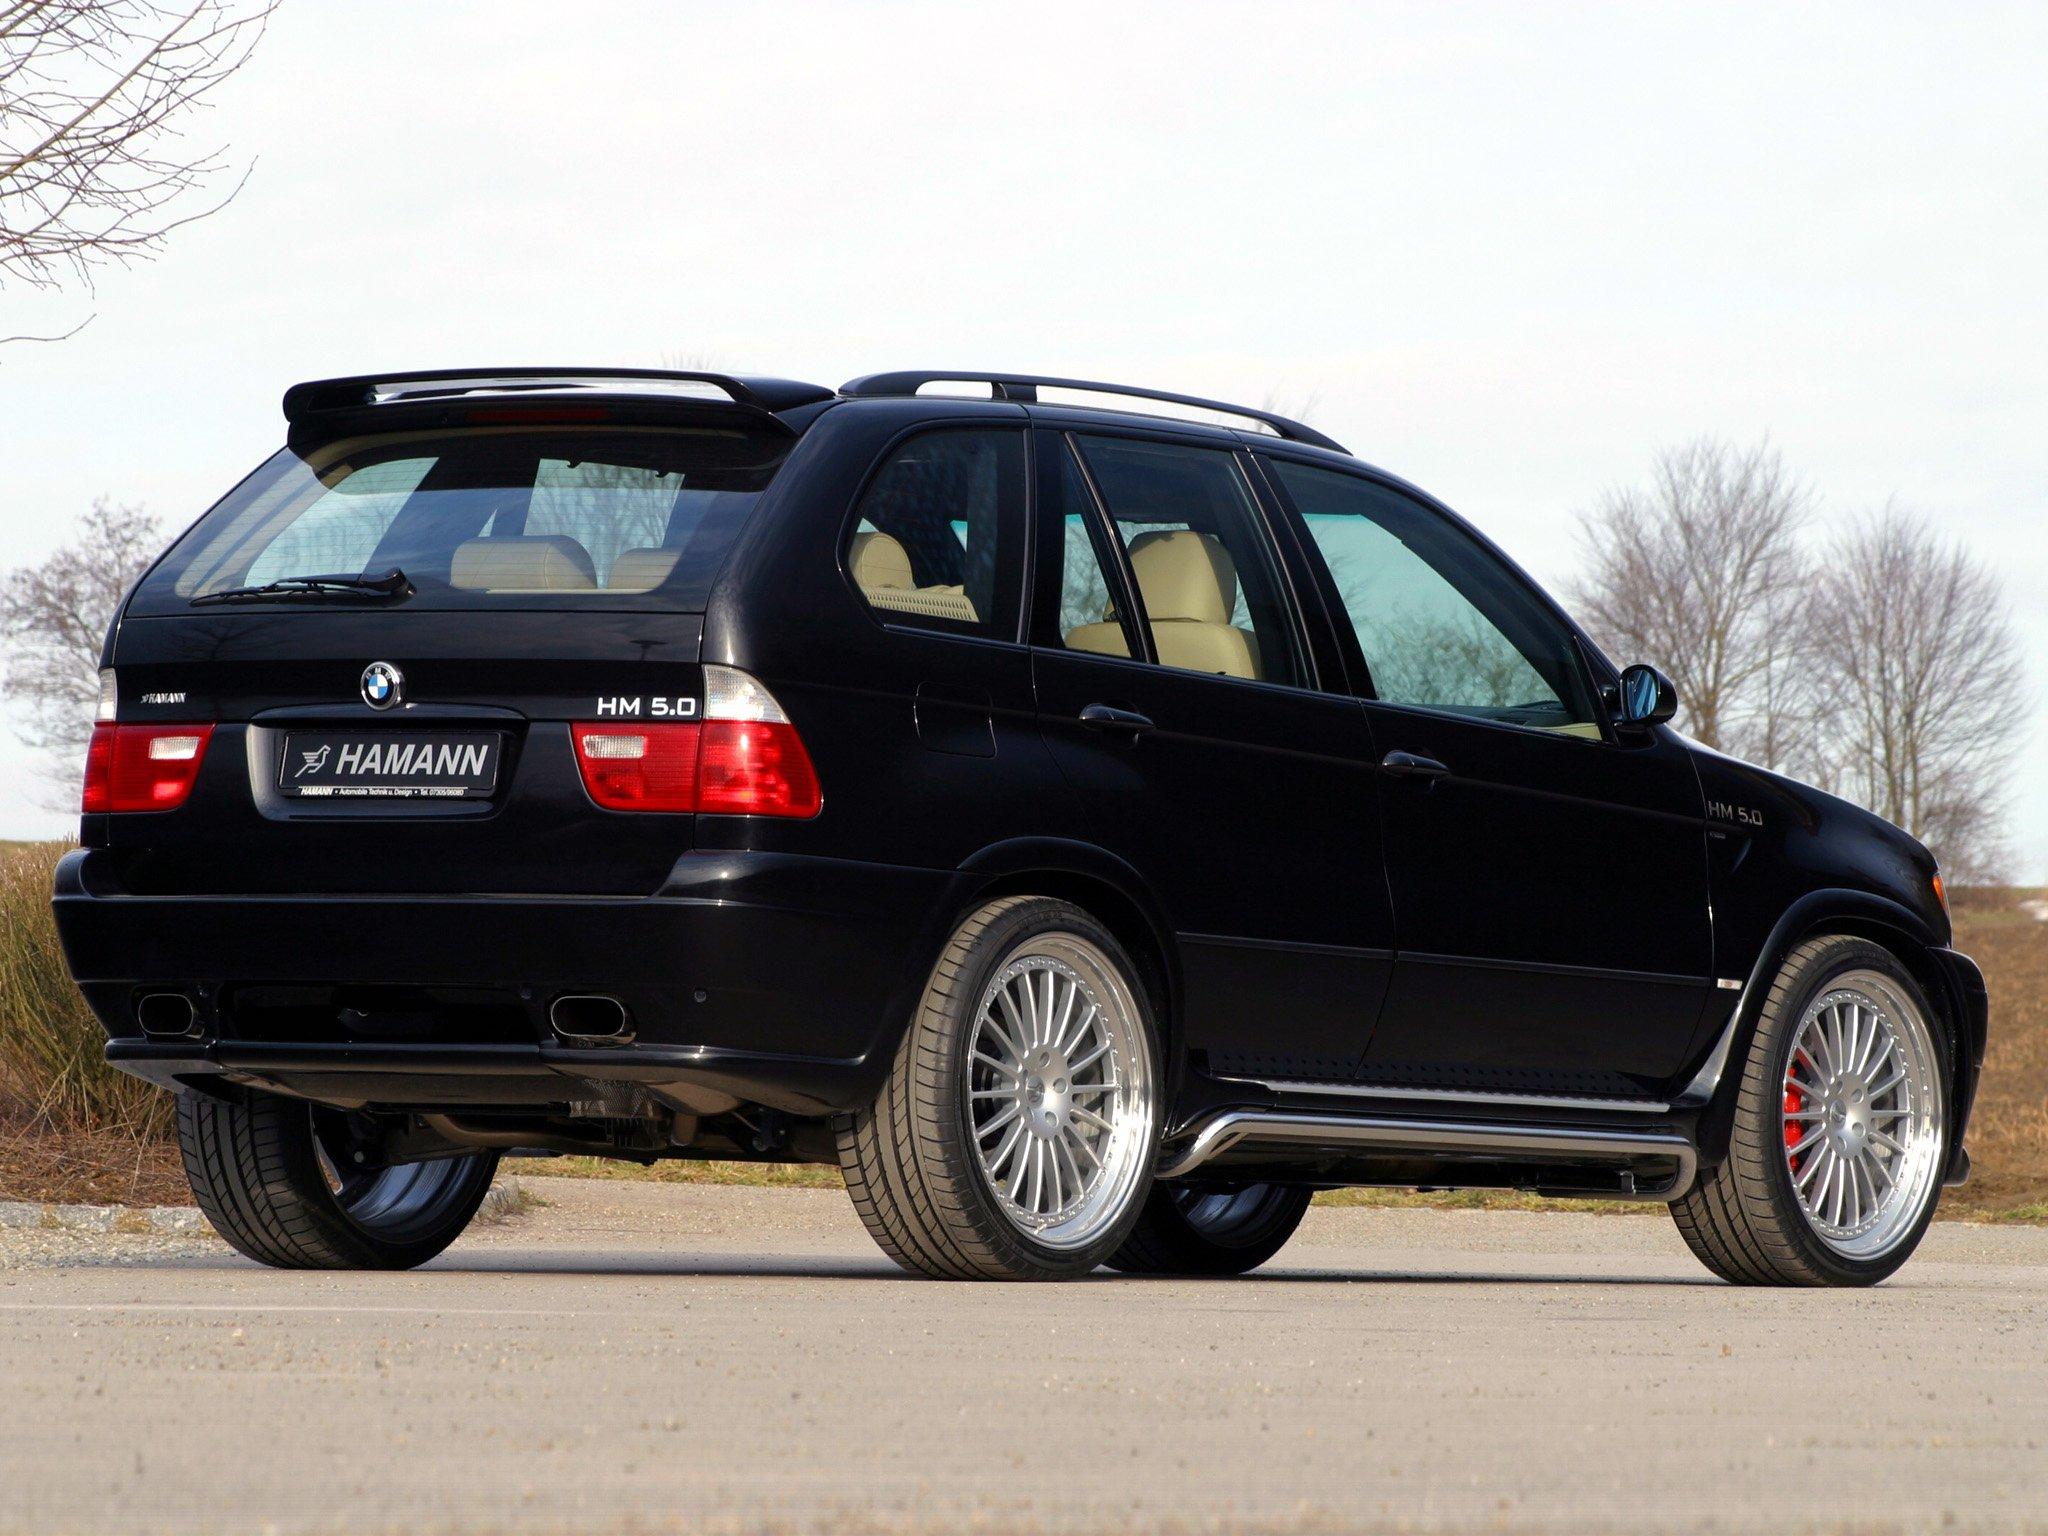 Hamann Bmw X5 E53 Modified Cars 2000 Wallpaper 2048x1536 744335 Wallpaperup